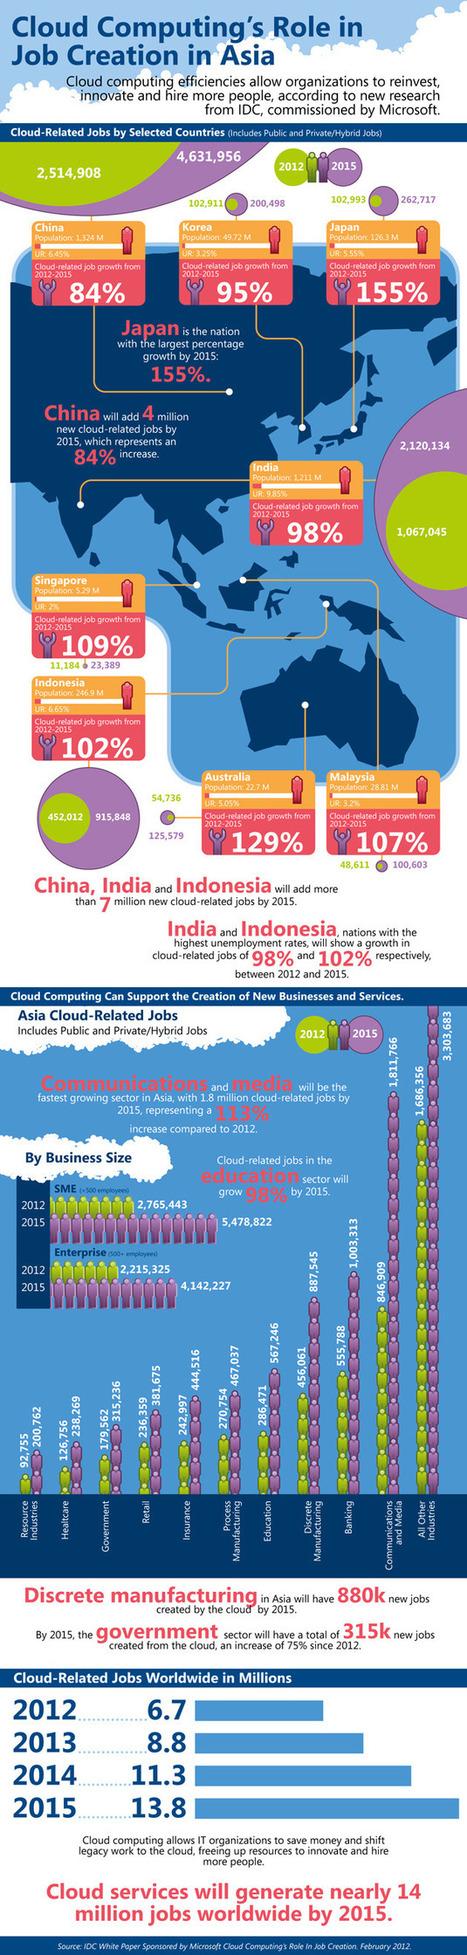 Cloud Computing's Role In Job Creation [INFOGRAPHIC] | Gestion de contenus, GED, workflows, ECM | Scoop.it